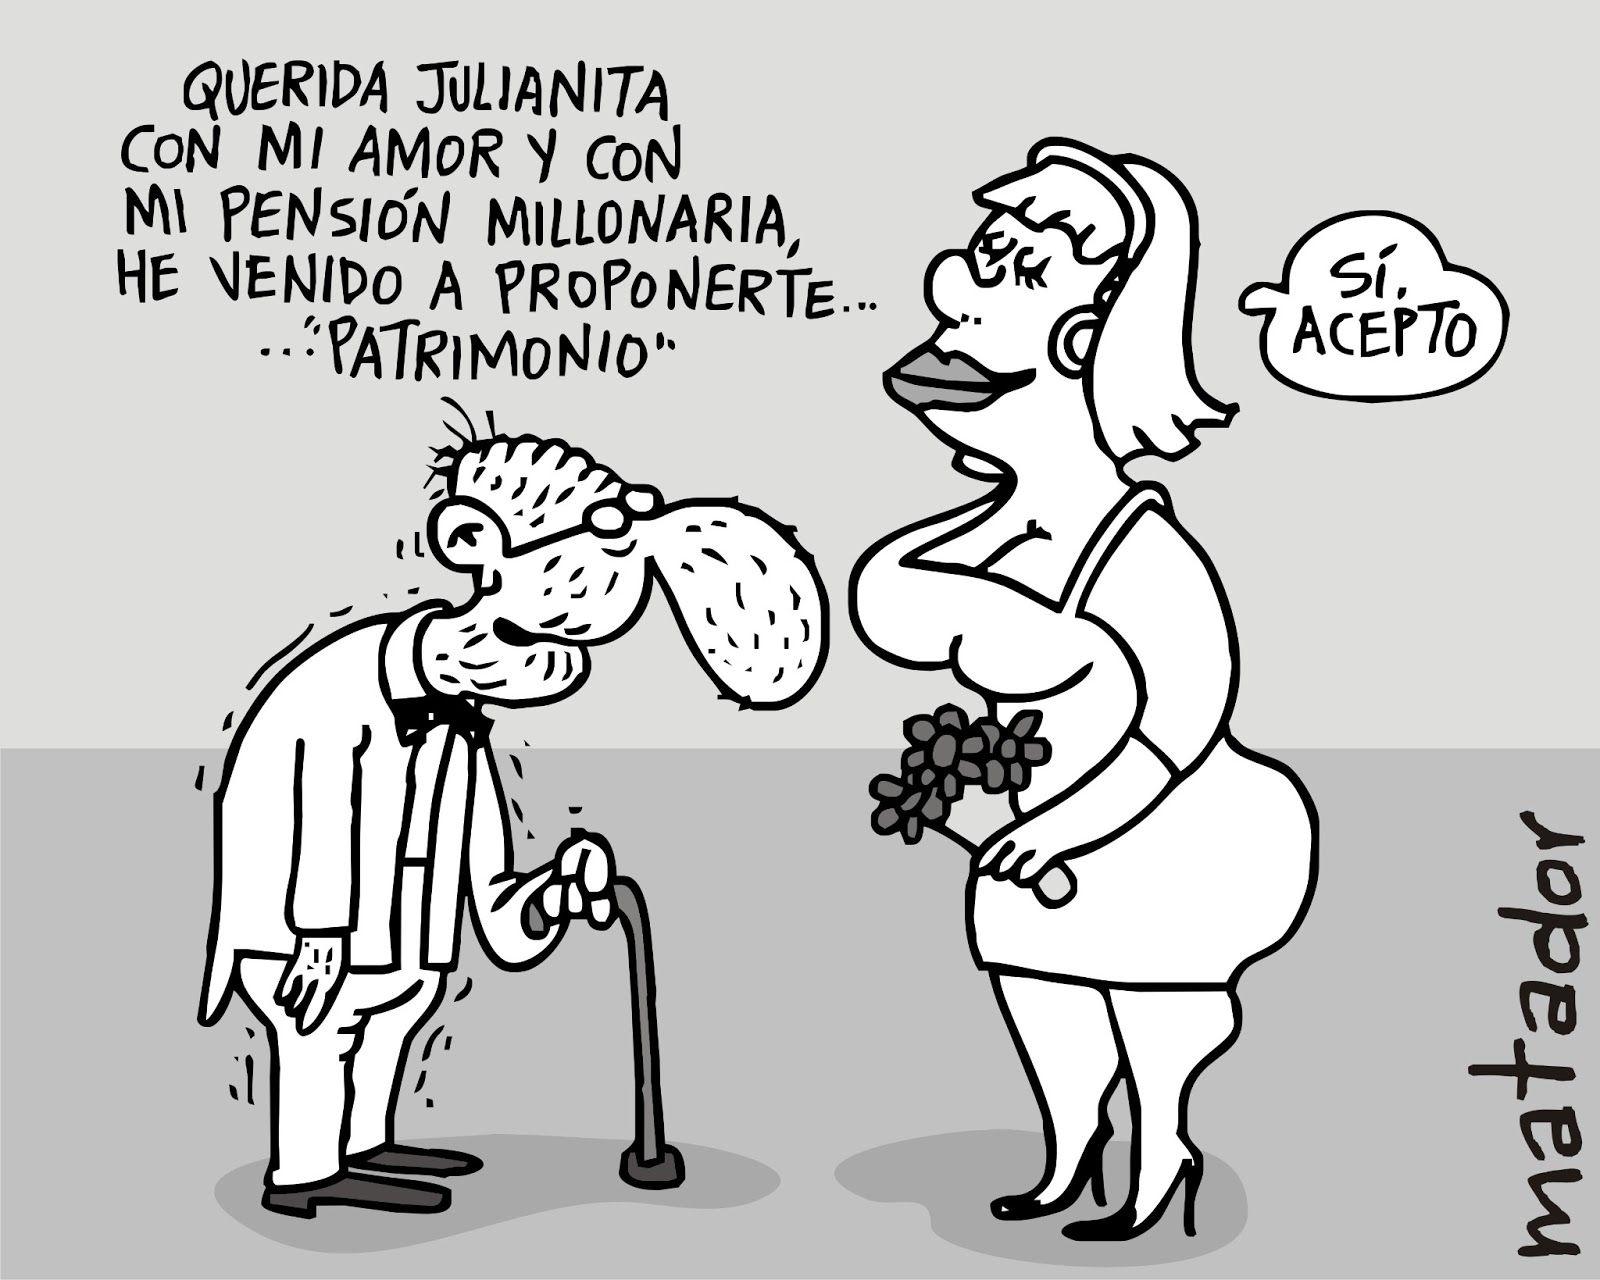 Matrimonio Por Conveniencia : Matrimonio por conveniencia lele rencontre avec l autre